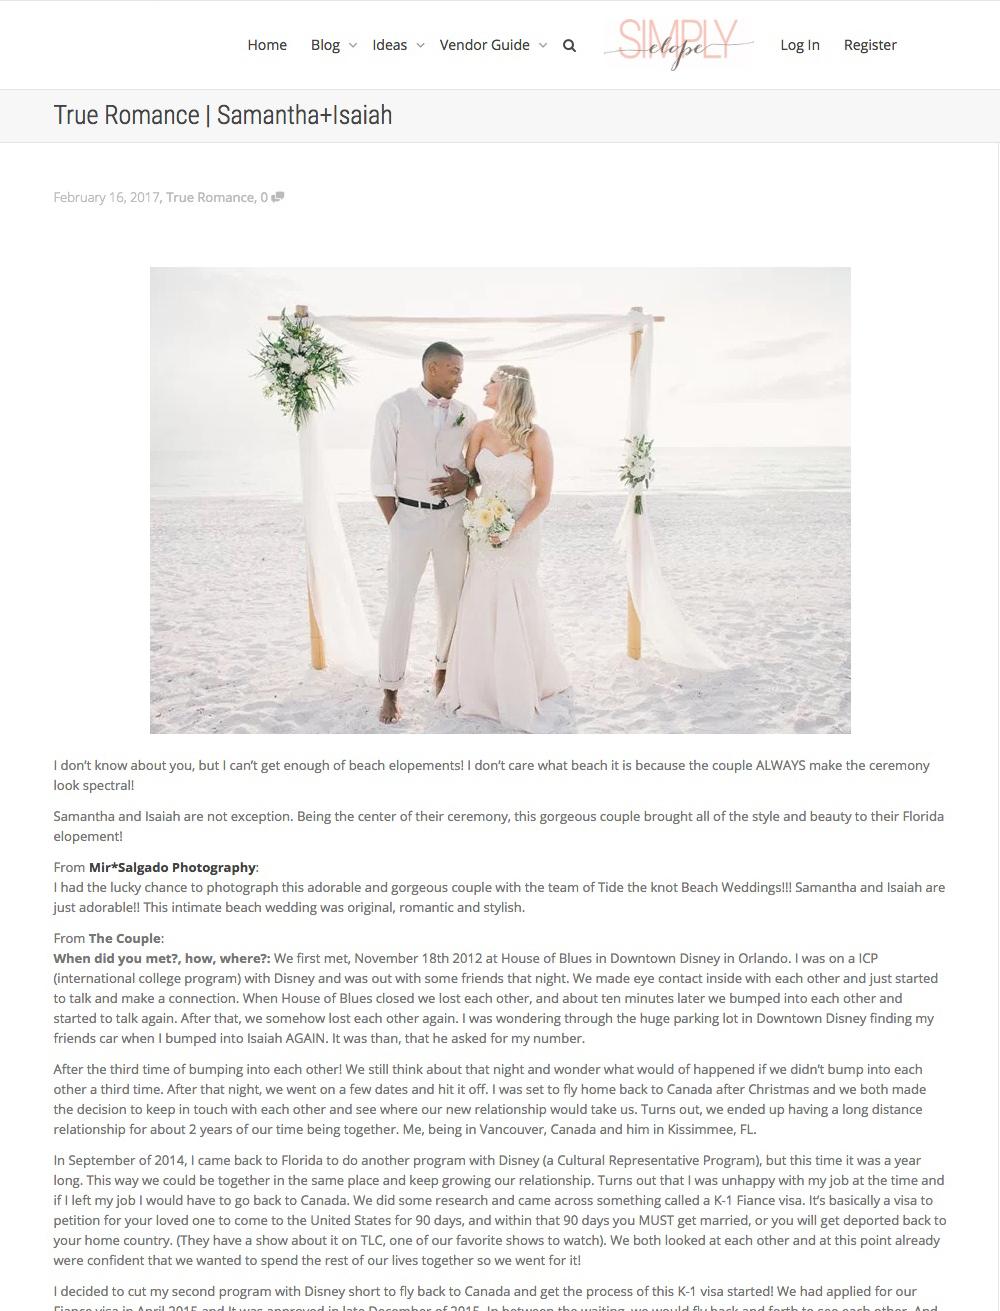 Tampa wedding photographer, Tampa wedding, St.Pete wedding photographer, Tampa photographer, Wedding photographer, St.Pete photographer, Mir Salgado Photography, Allura Studios